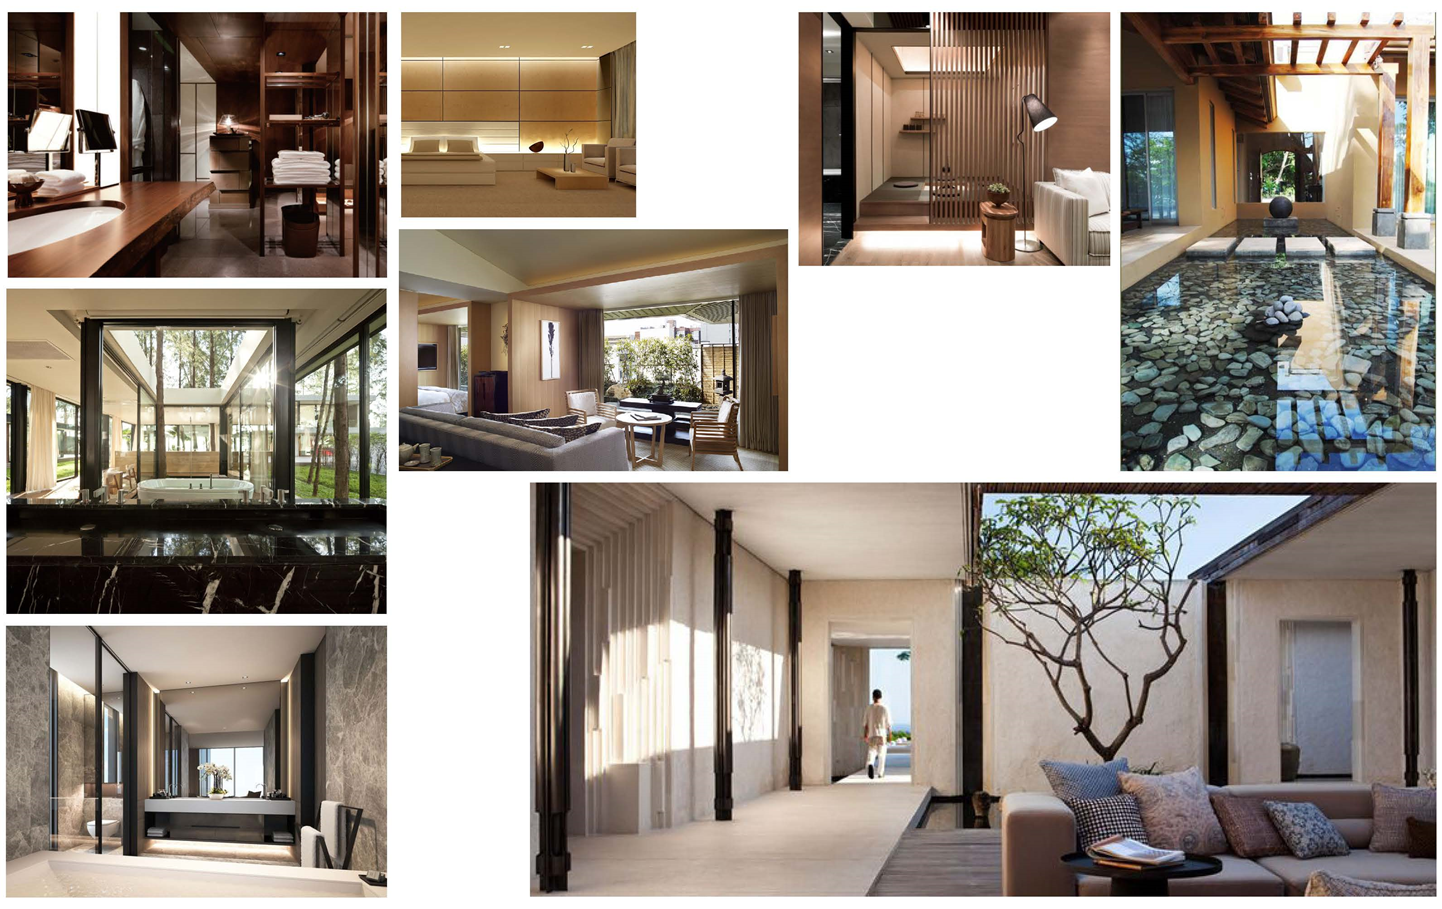 charles_tang_design_hangzhou_mangrove_tree_resort_villa_china 4